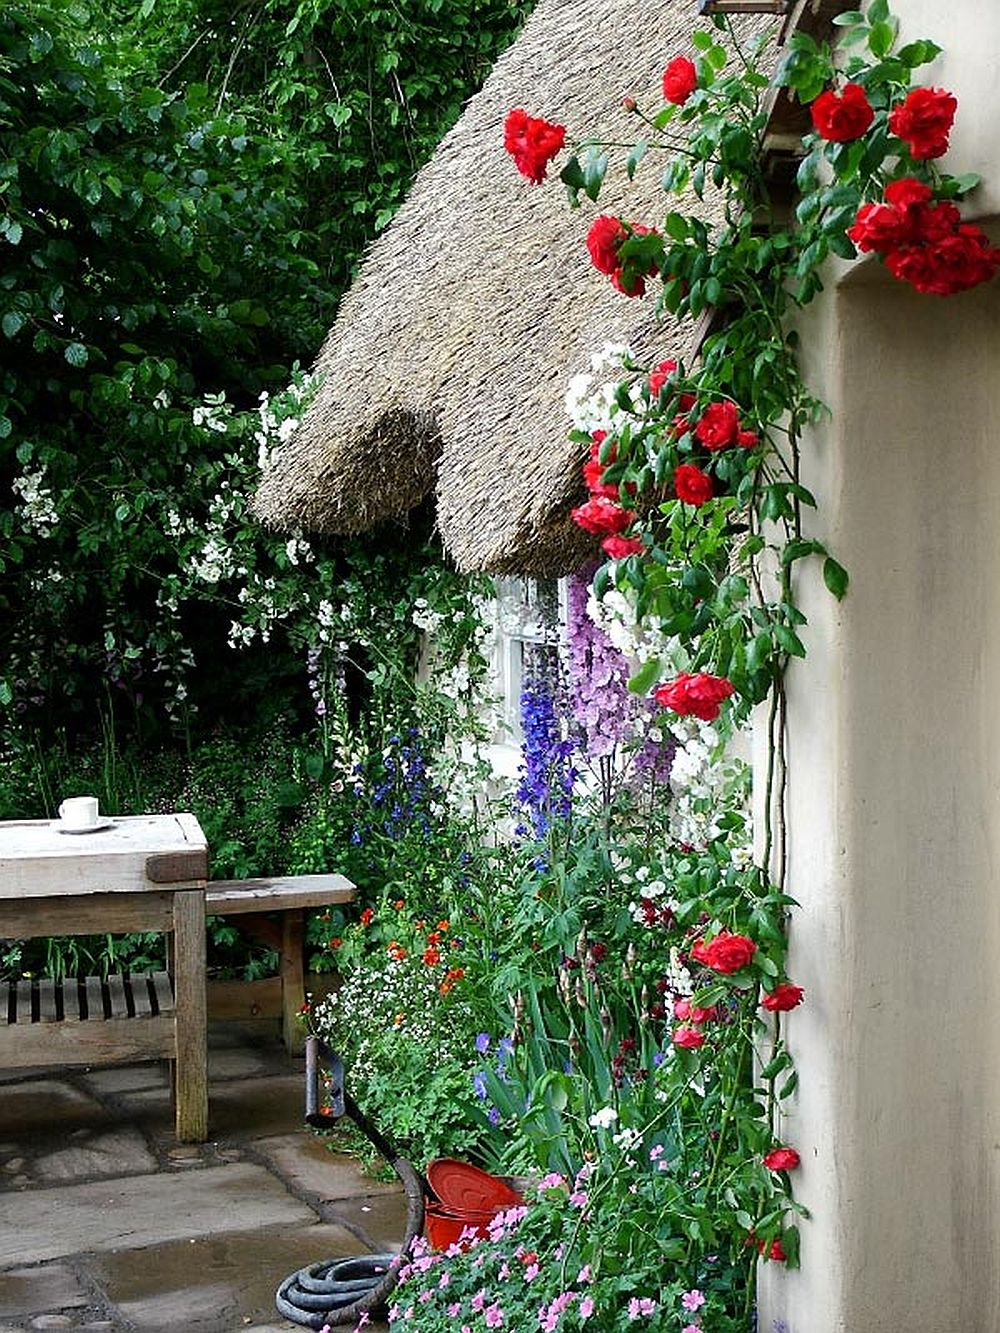 adelaparvu.com despre gradina rustica englezeasca, gradina Anglia, gradina Chelsea Pensioners Garden, designer peisagist Julian Dowle, Foto blog MooseysCountryGarden (4)